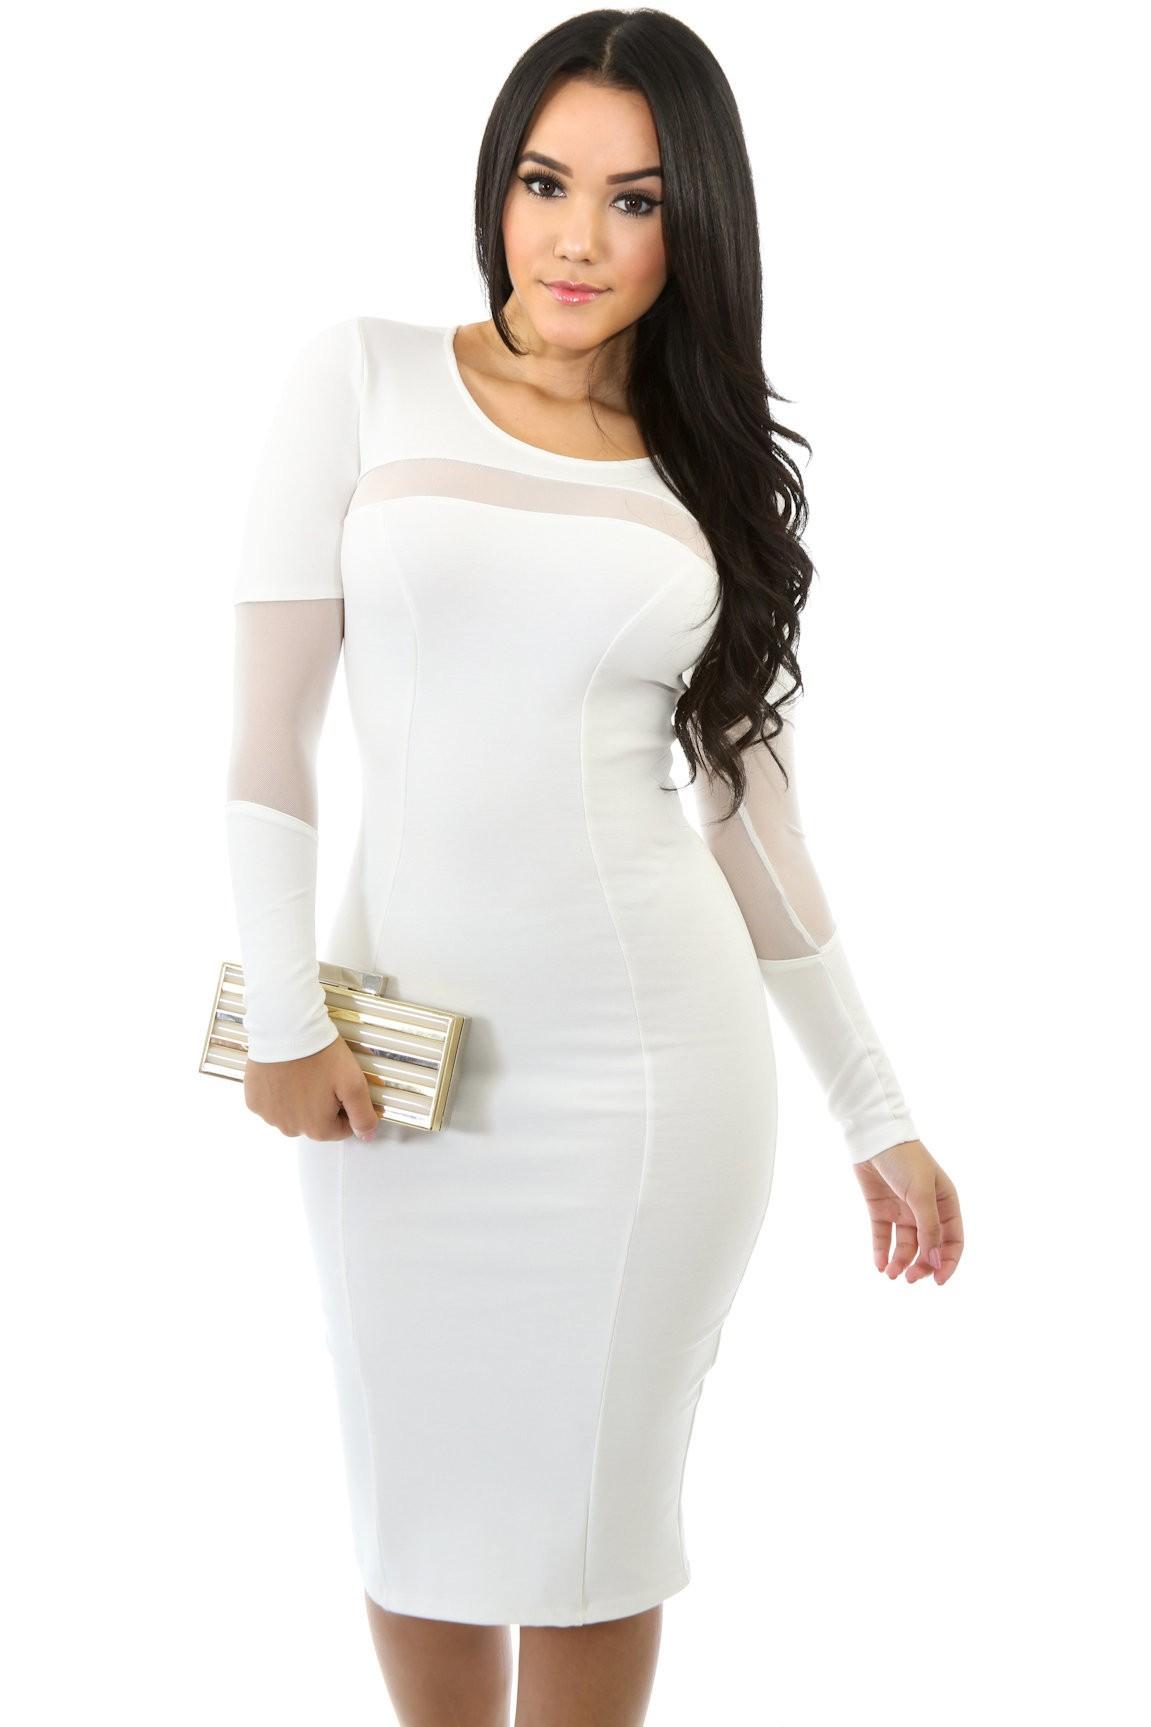 Mesh Replacement Dress